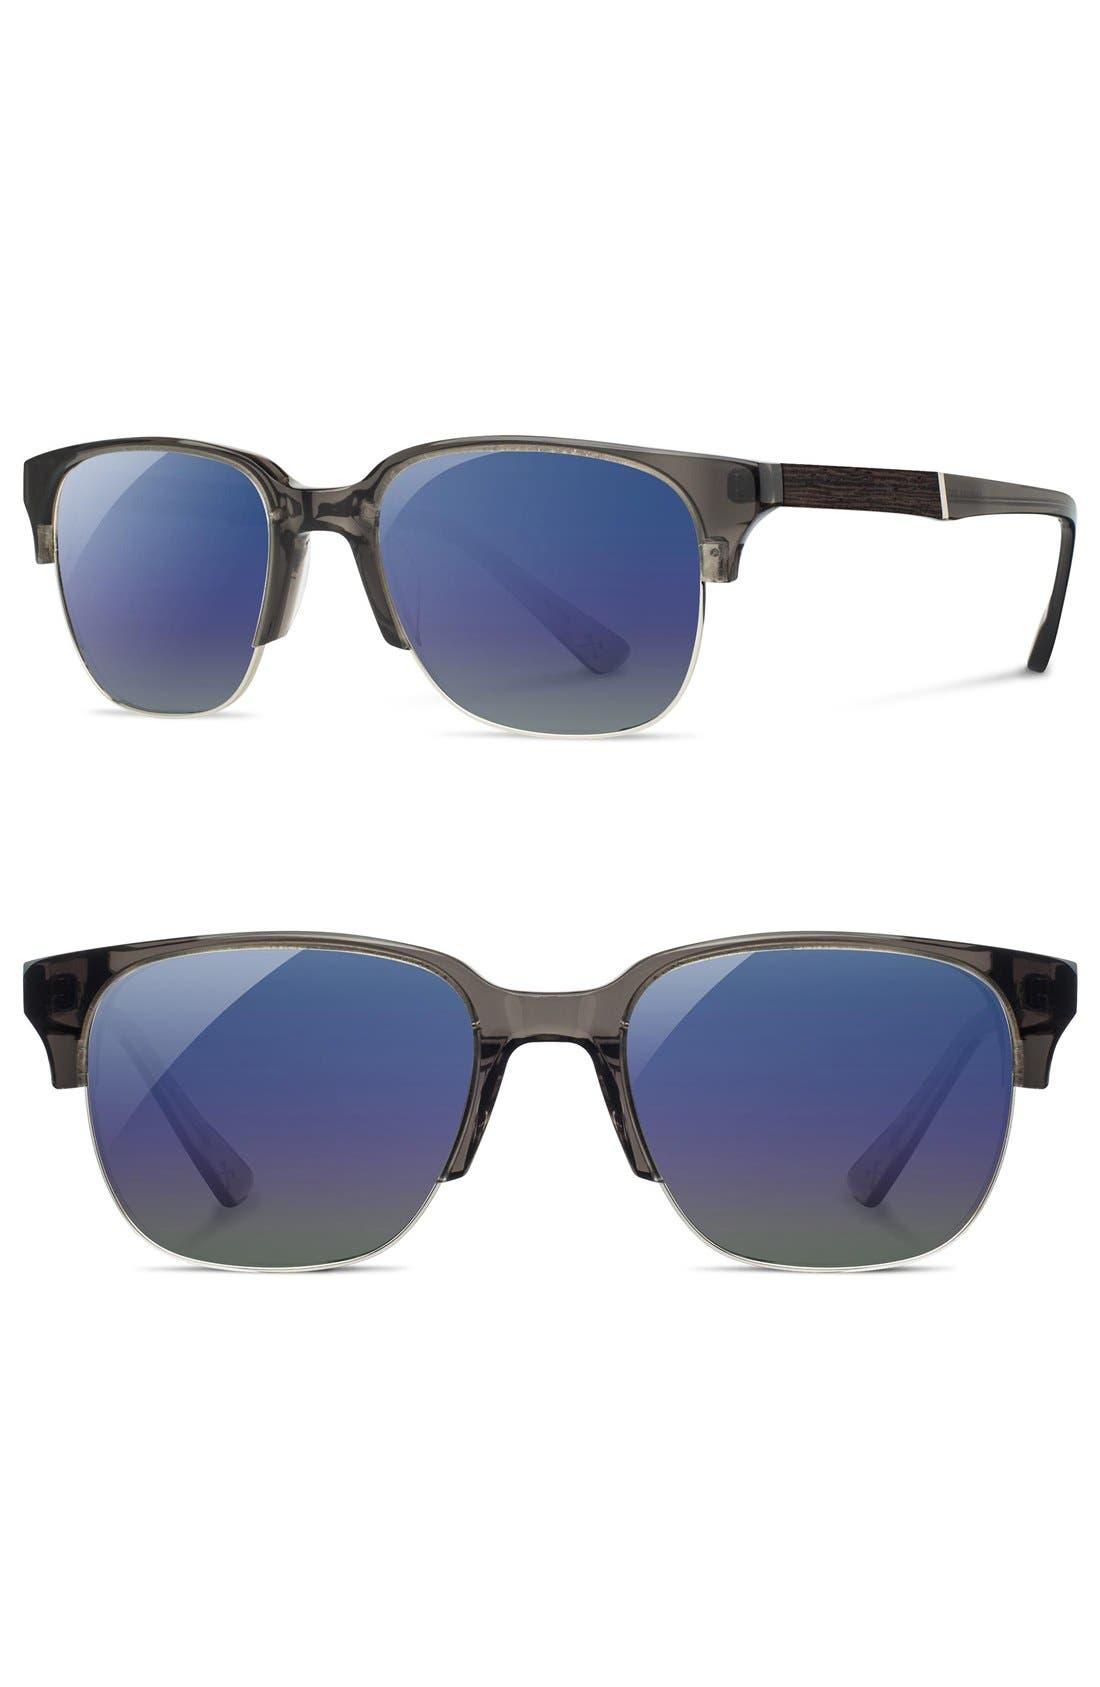 SHWOOD Newport 52mm Polarized Sunglasses